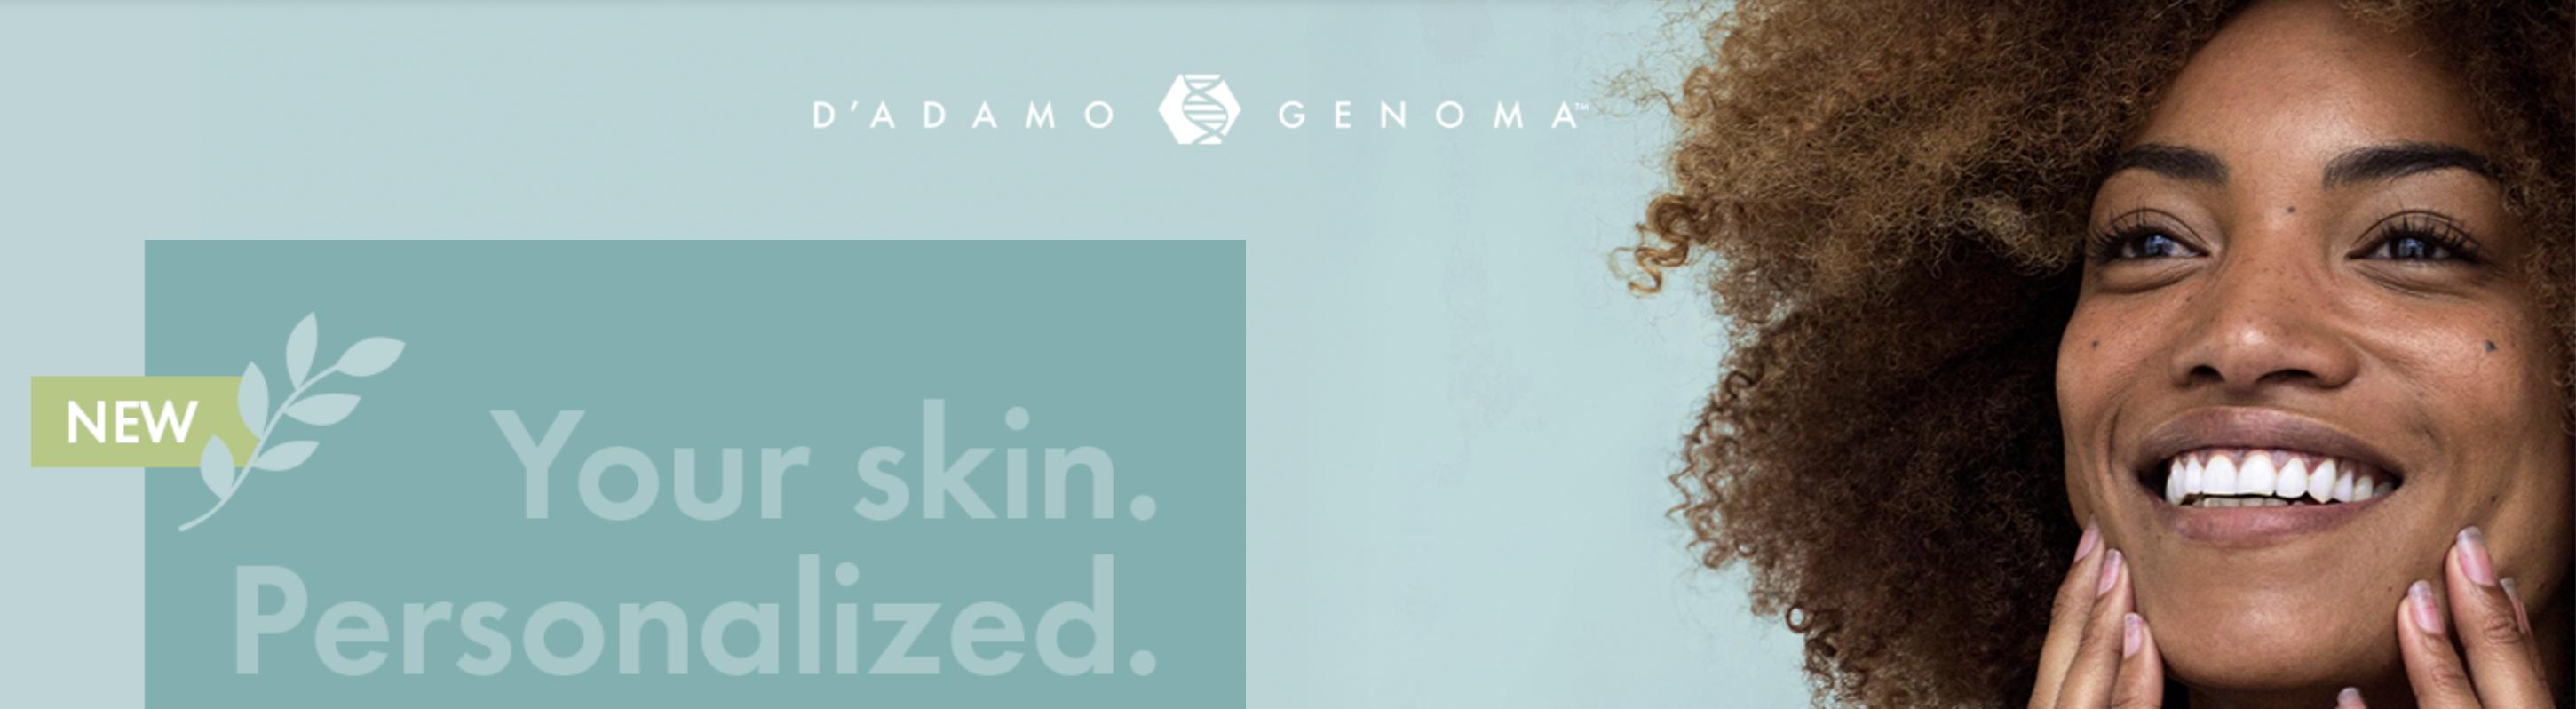 D'Adamo Genoma - Your Skin Personalised